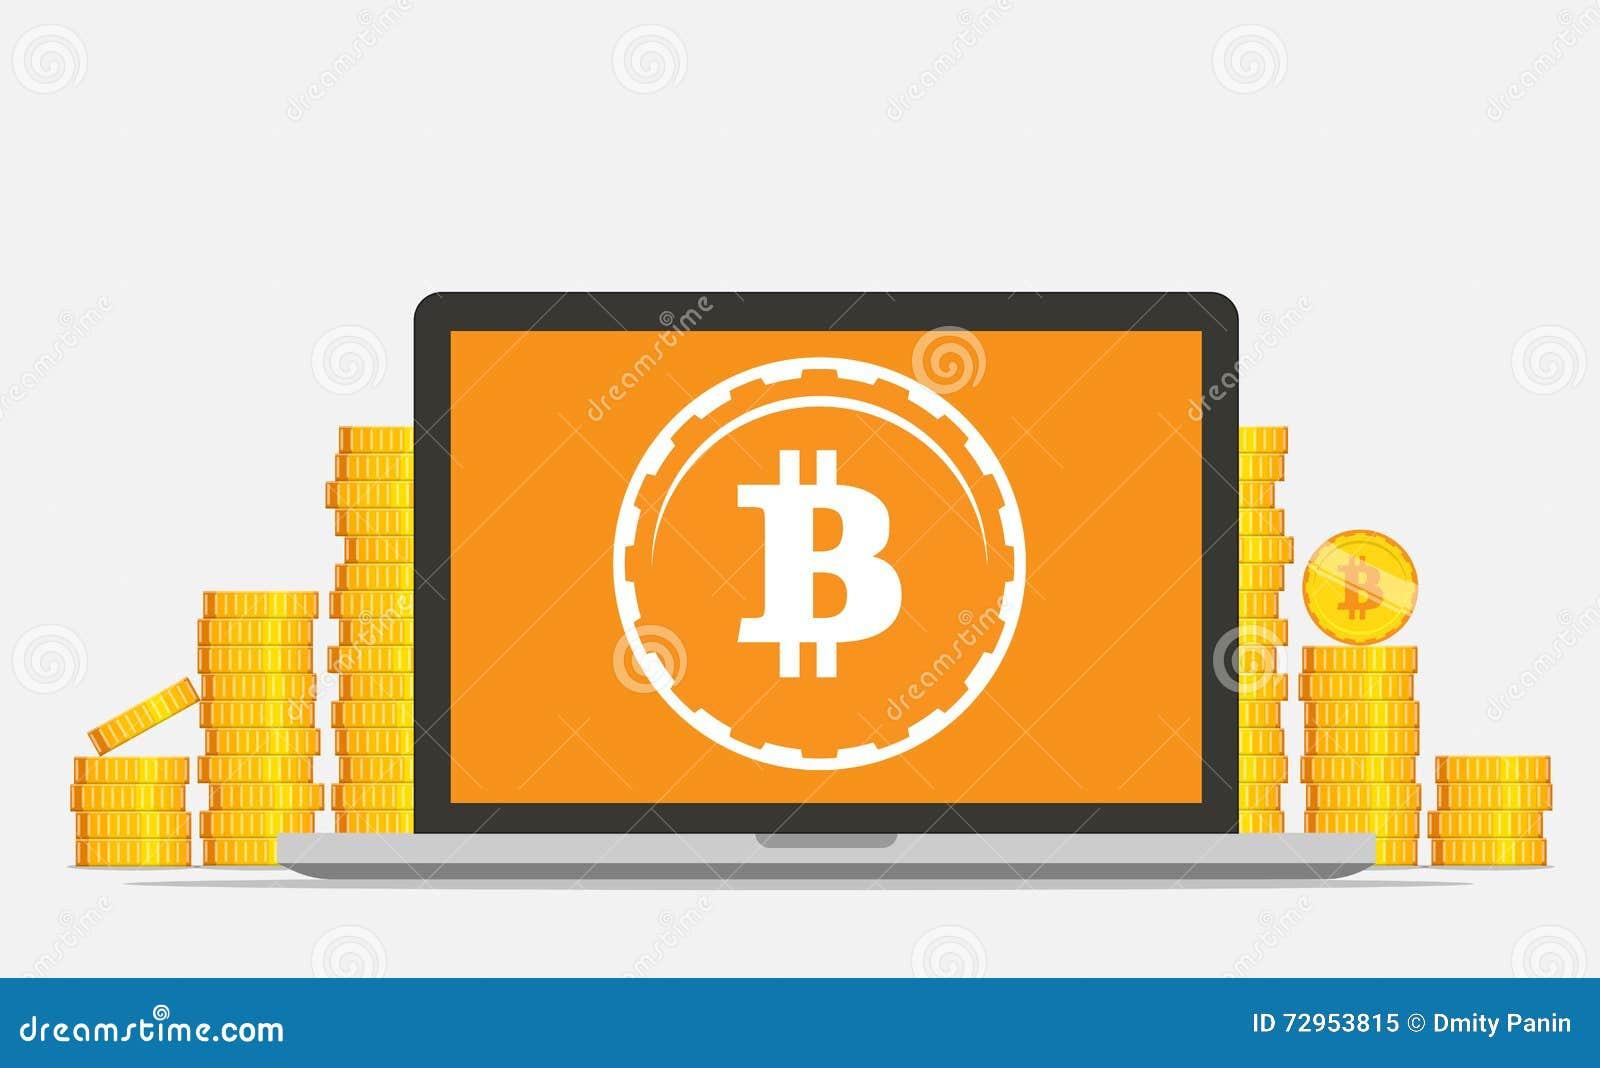 How to buy bitcoin cashyahoo finance